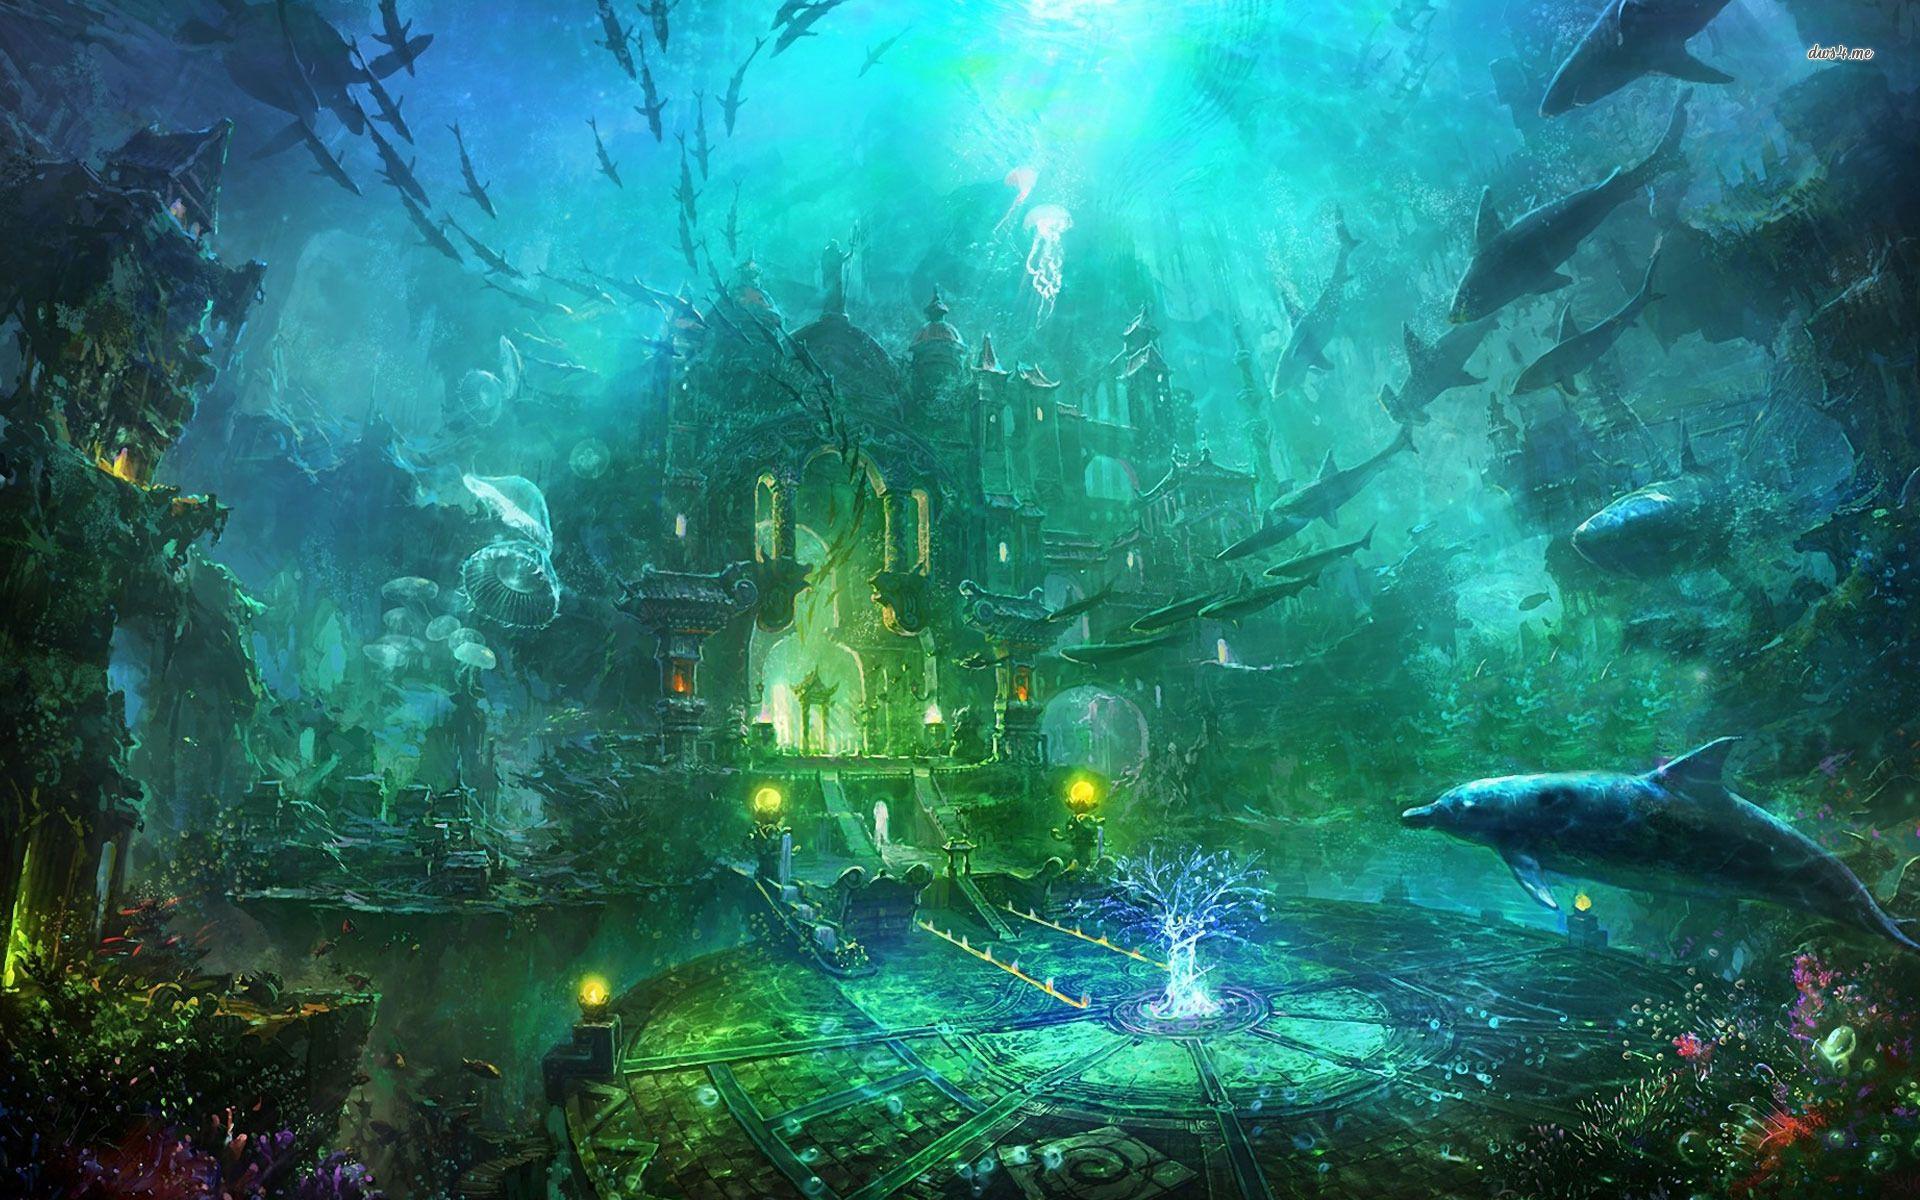 Underwater castle | Fantasy Art: Land/Cityscapes ...